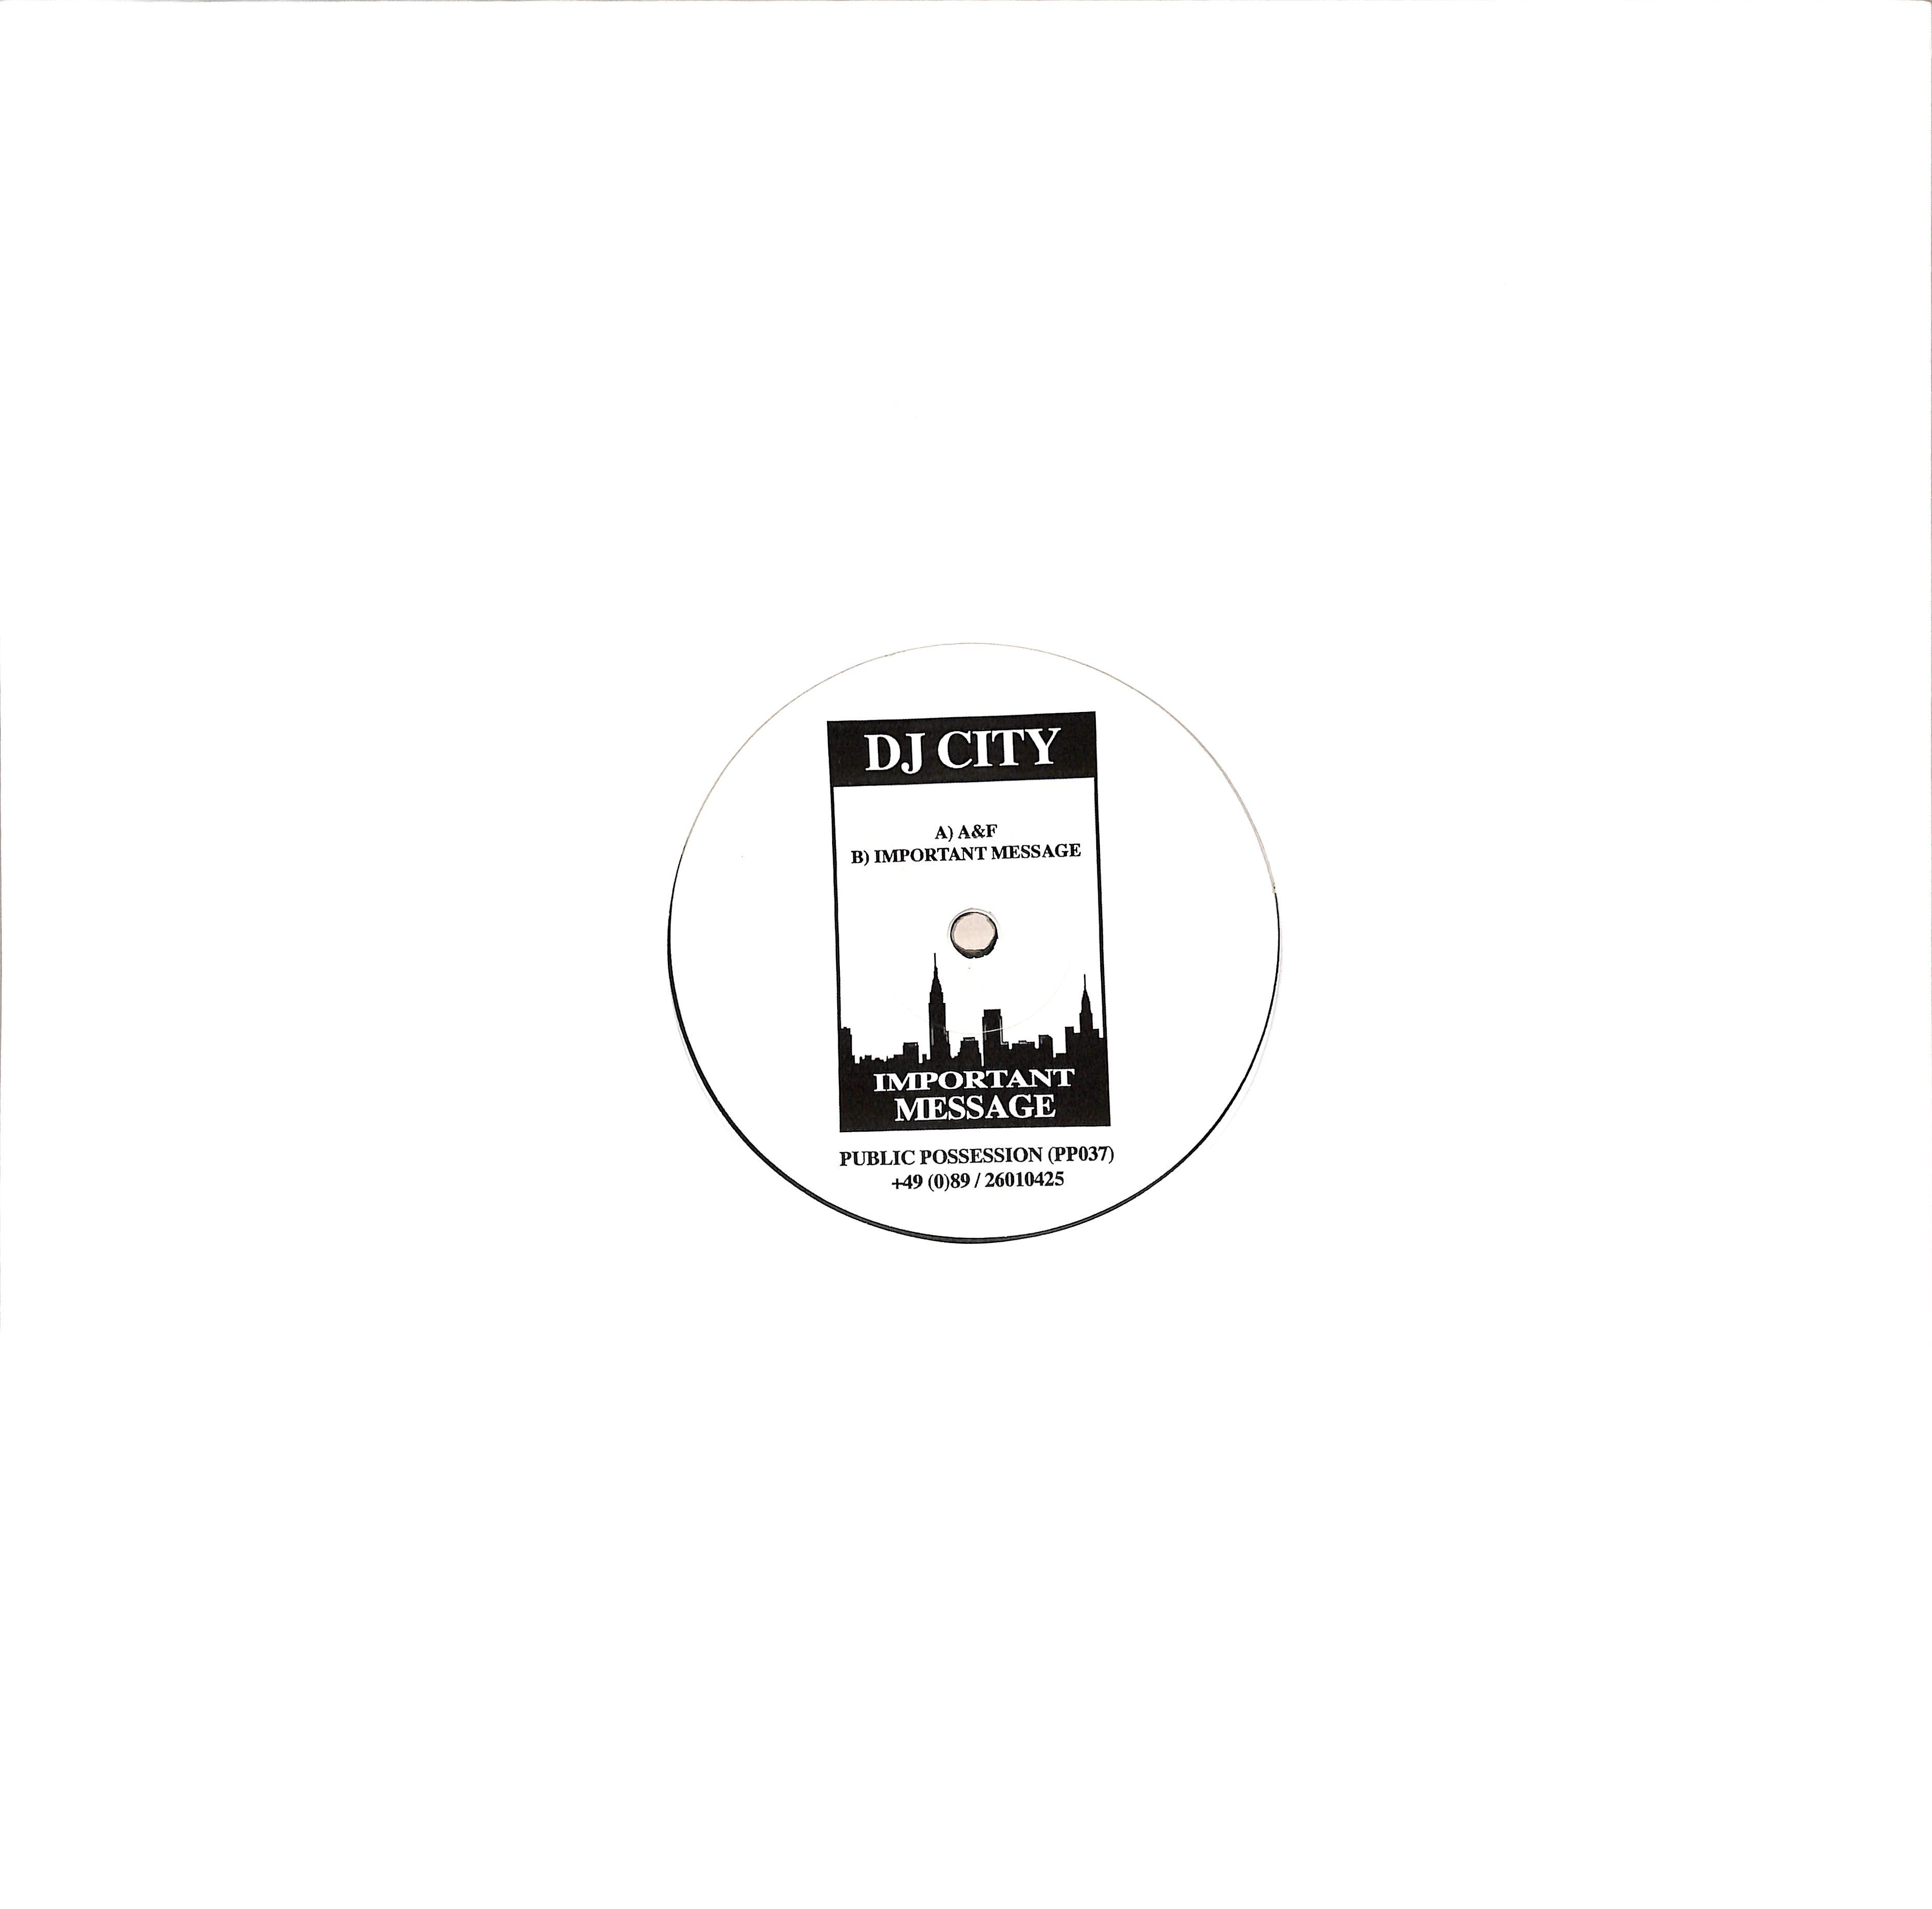 DJ City - IMPORTANT MESSAGE